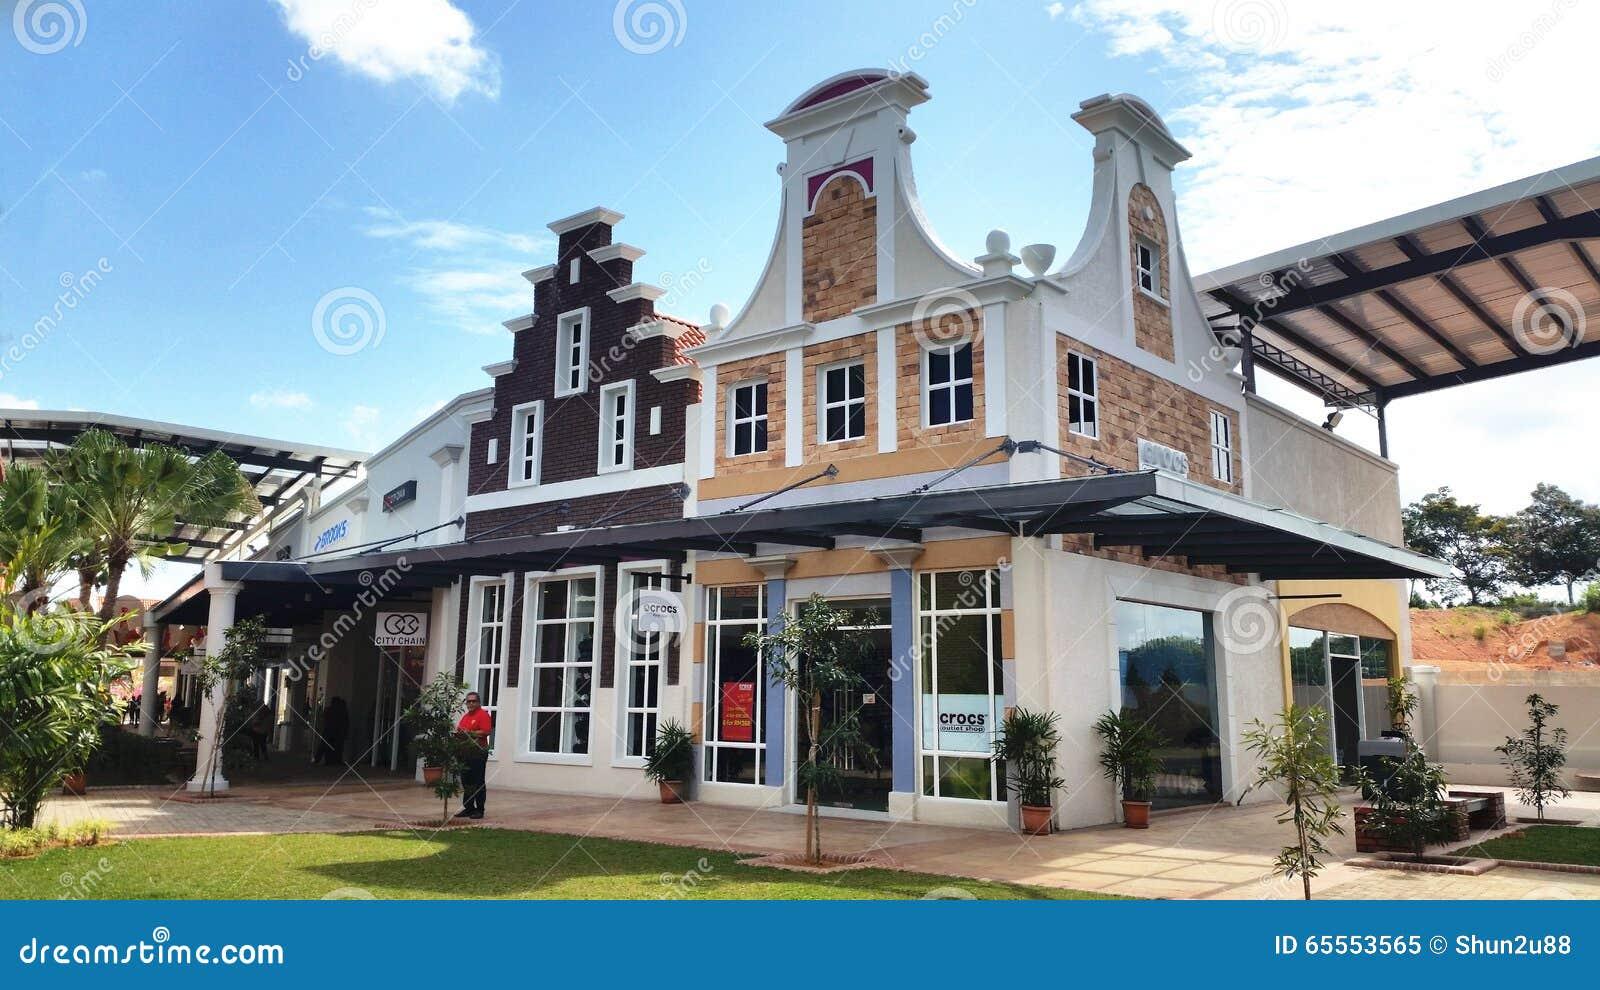 Malaysia Melaka Premium Outlet Boutique Centre Editorial Image - Image: 65553565